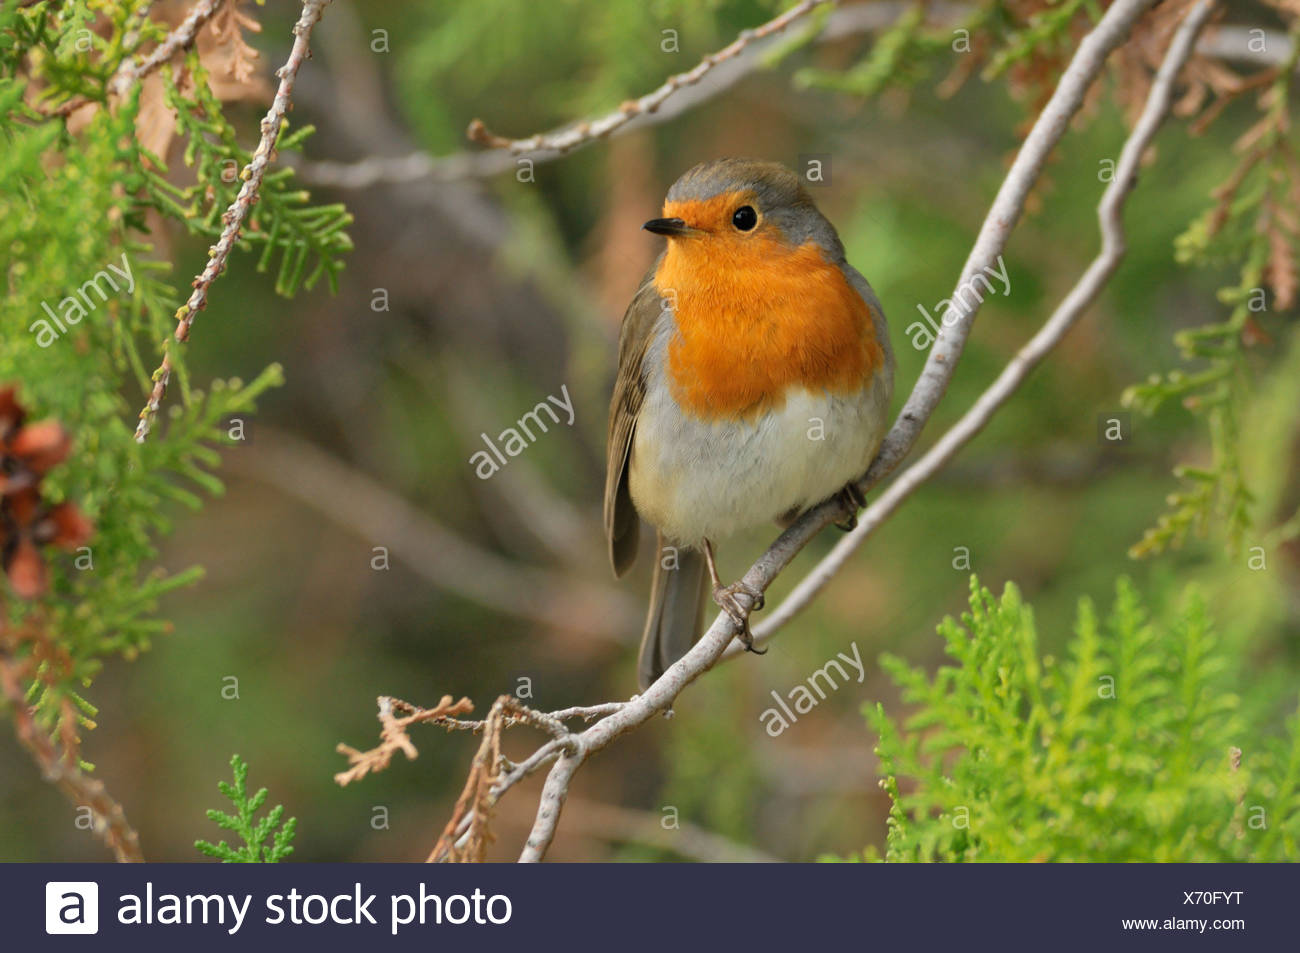 volwassen roodborst op tak; adult european robin on branch - Stock Image